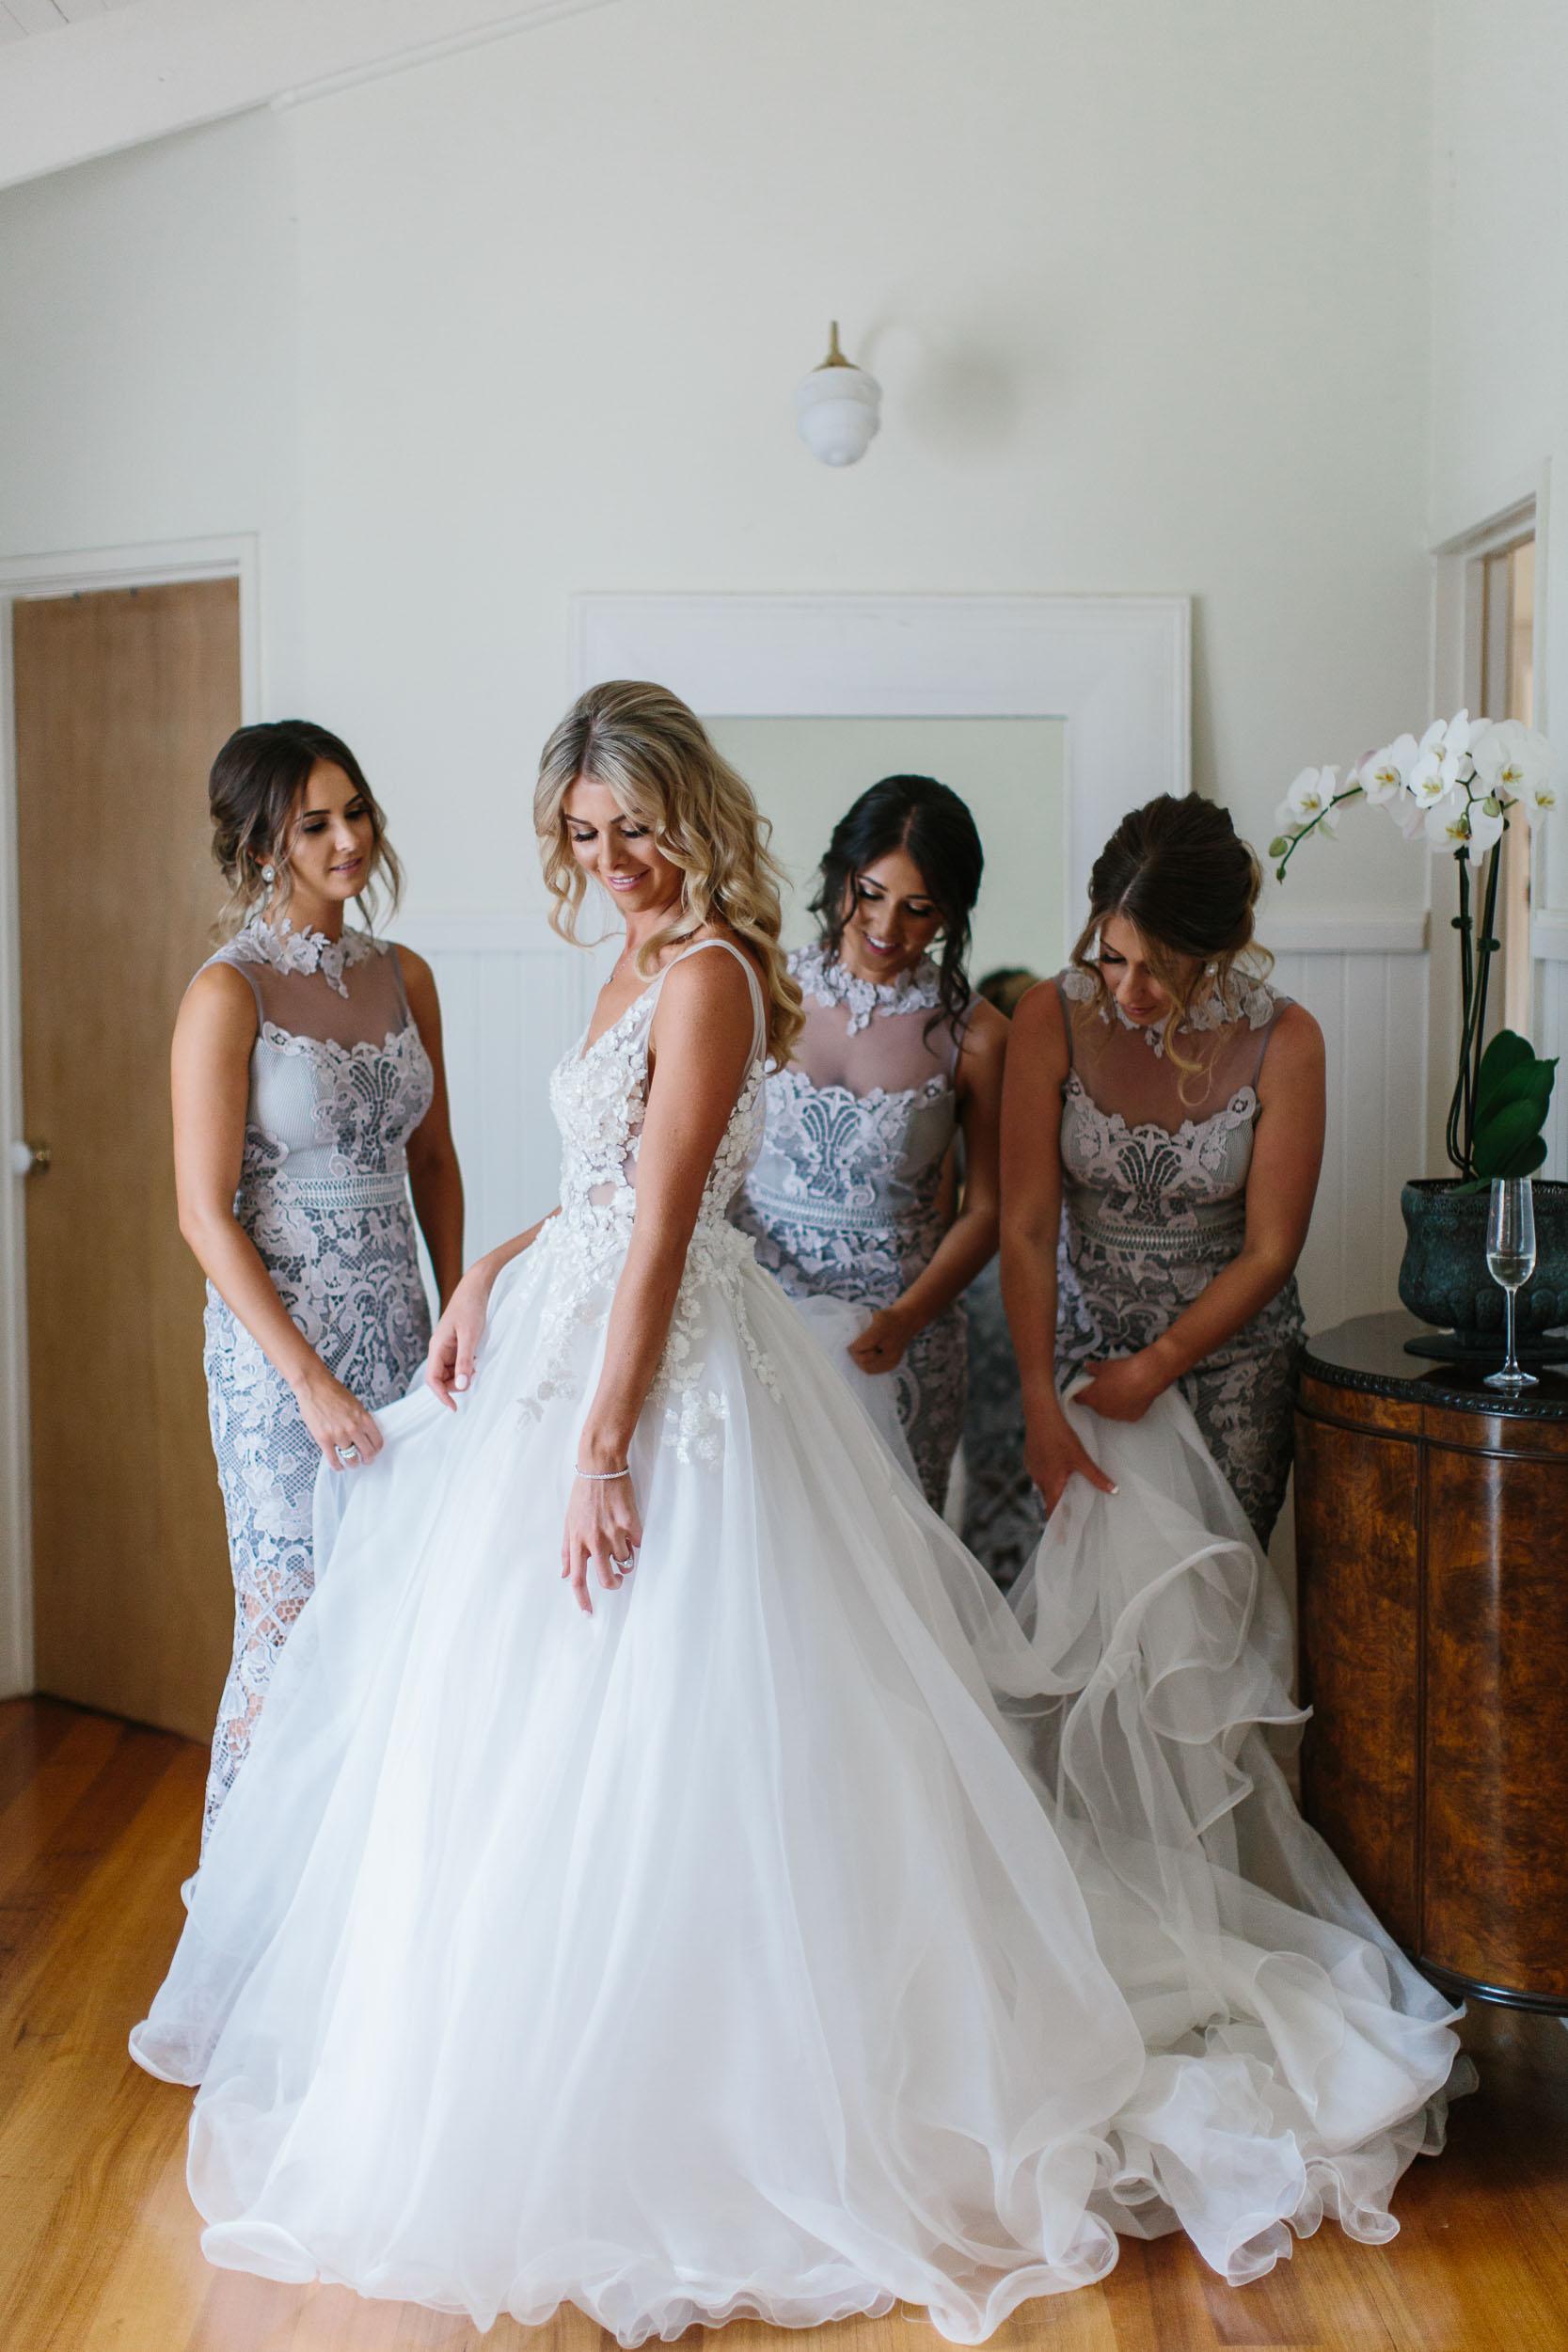 Kas-Richards-Mornington-Peninsula-Private-Property-Wedding-Marianna-Hardwick-Gown-90.jpg